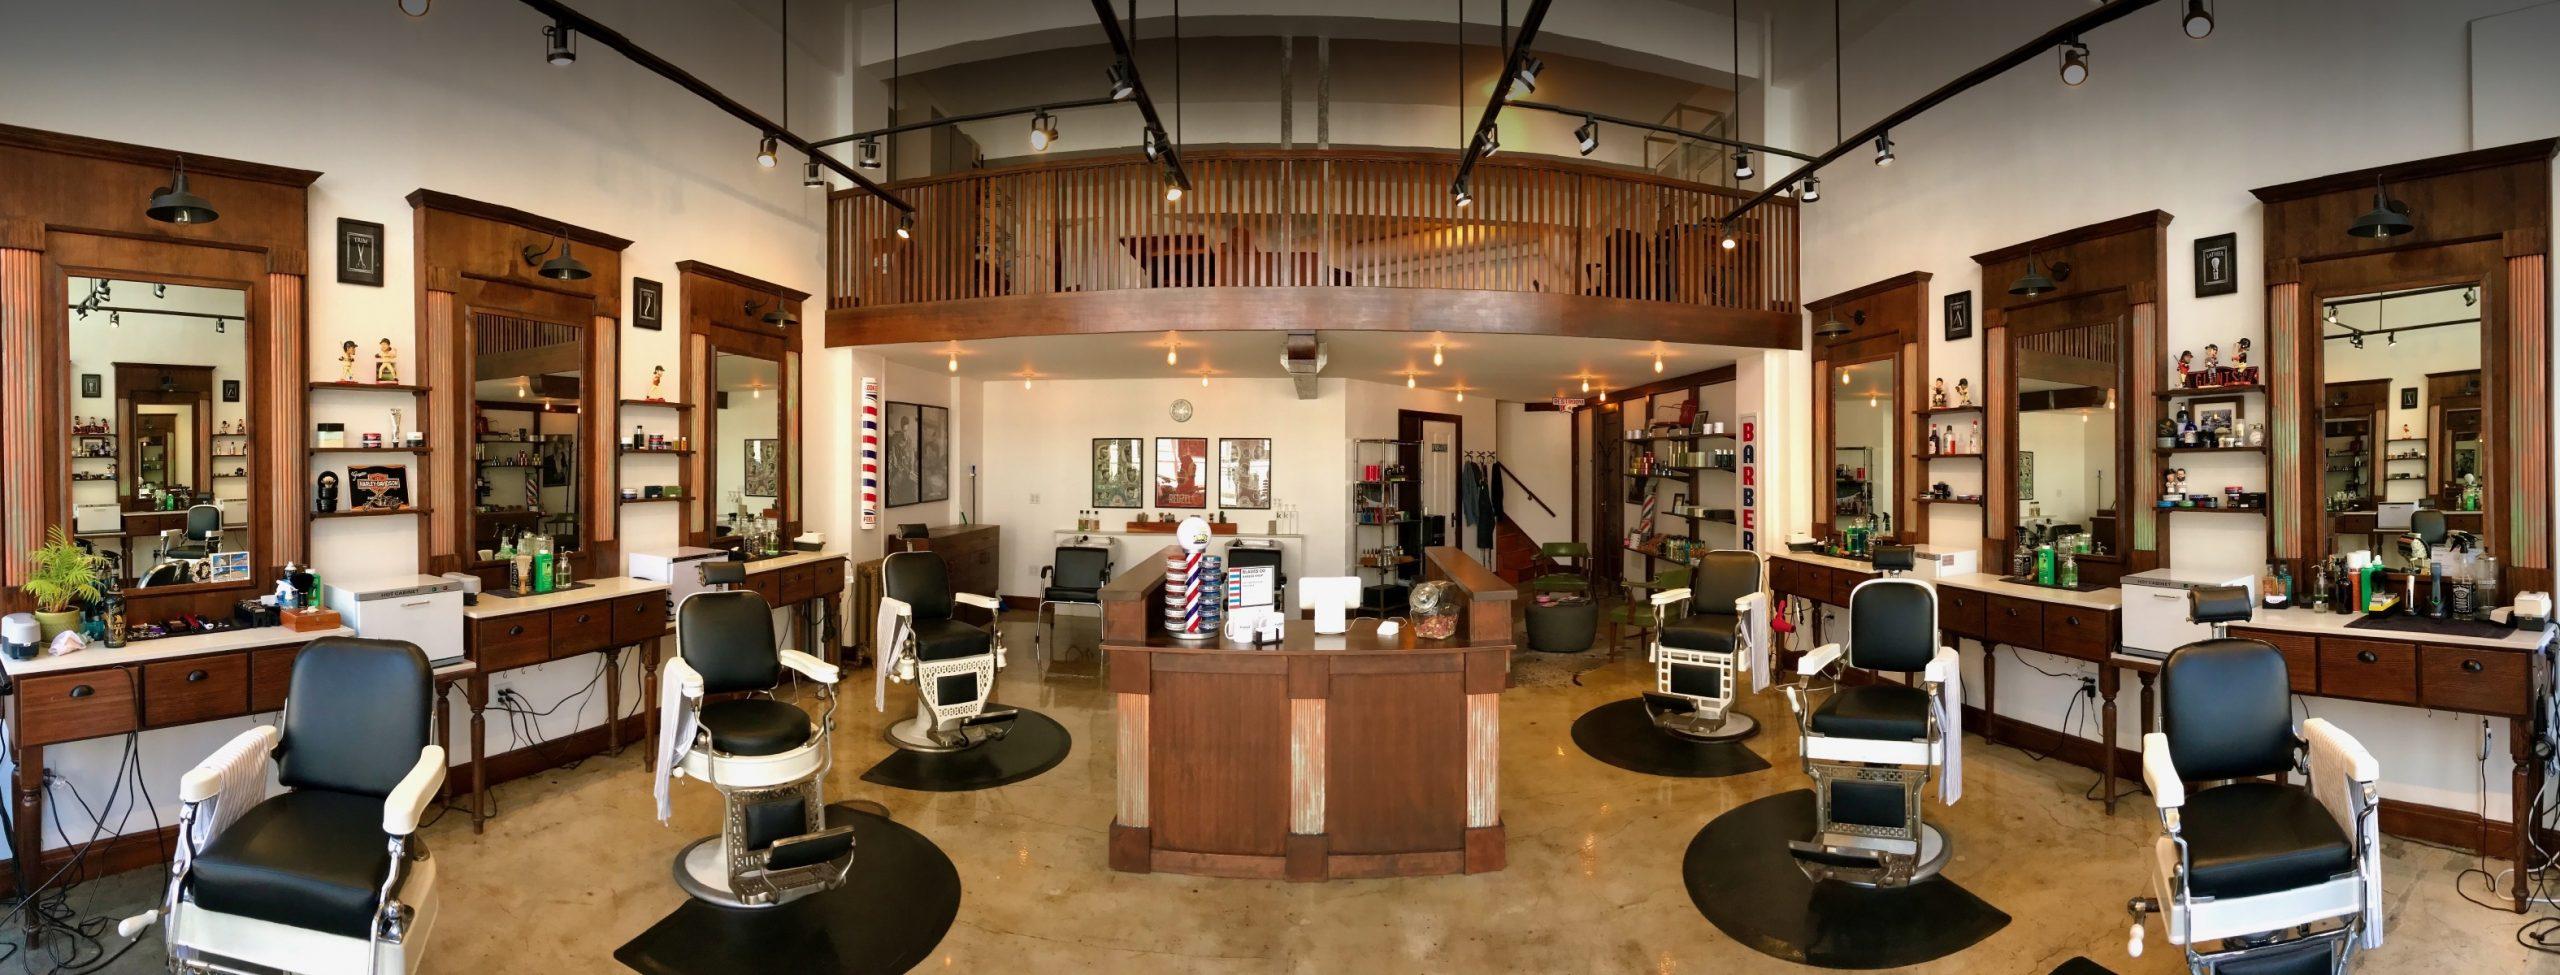 Blades Co. barber shop San Francisco